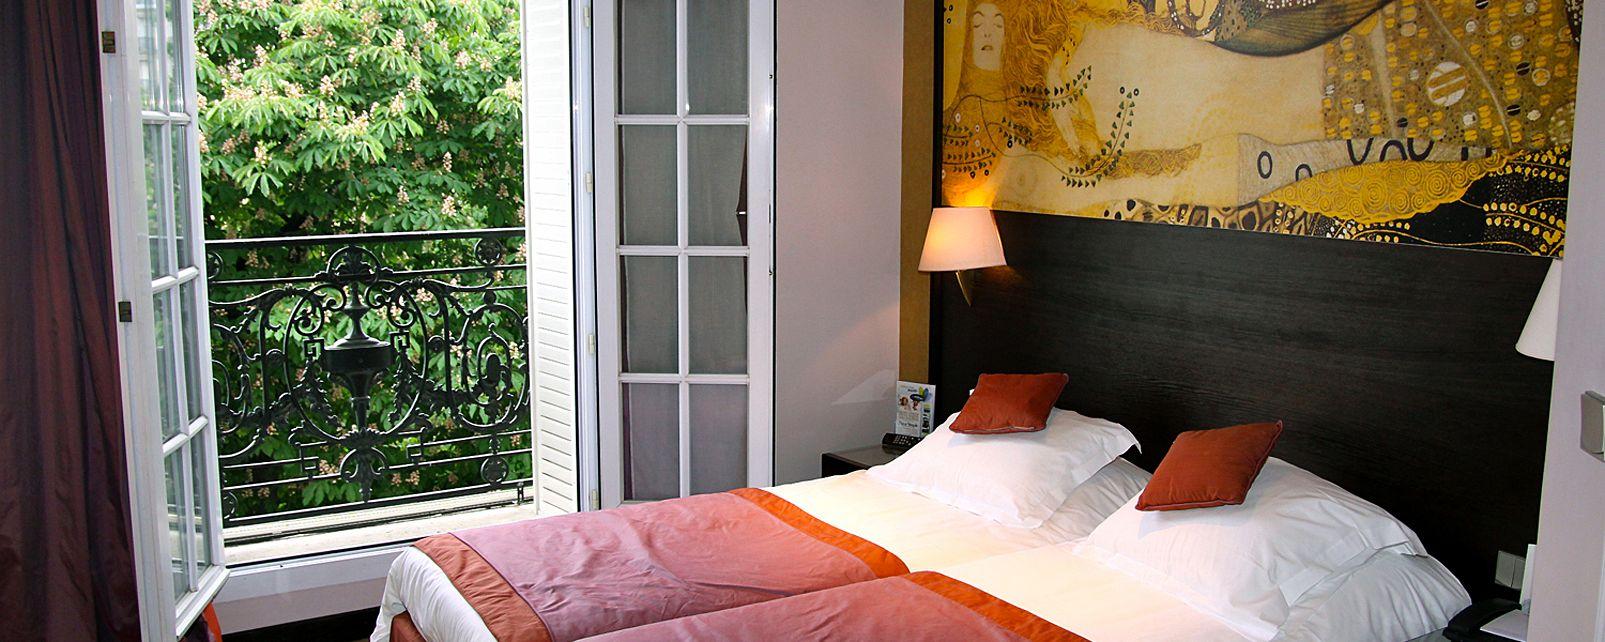 Little Palace Hotel Parigi